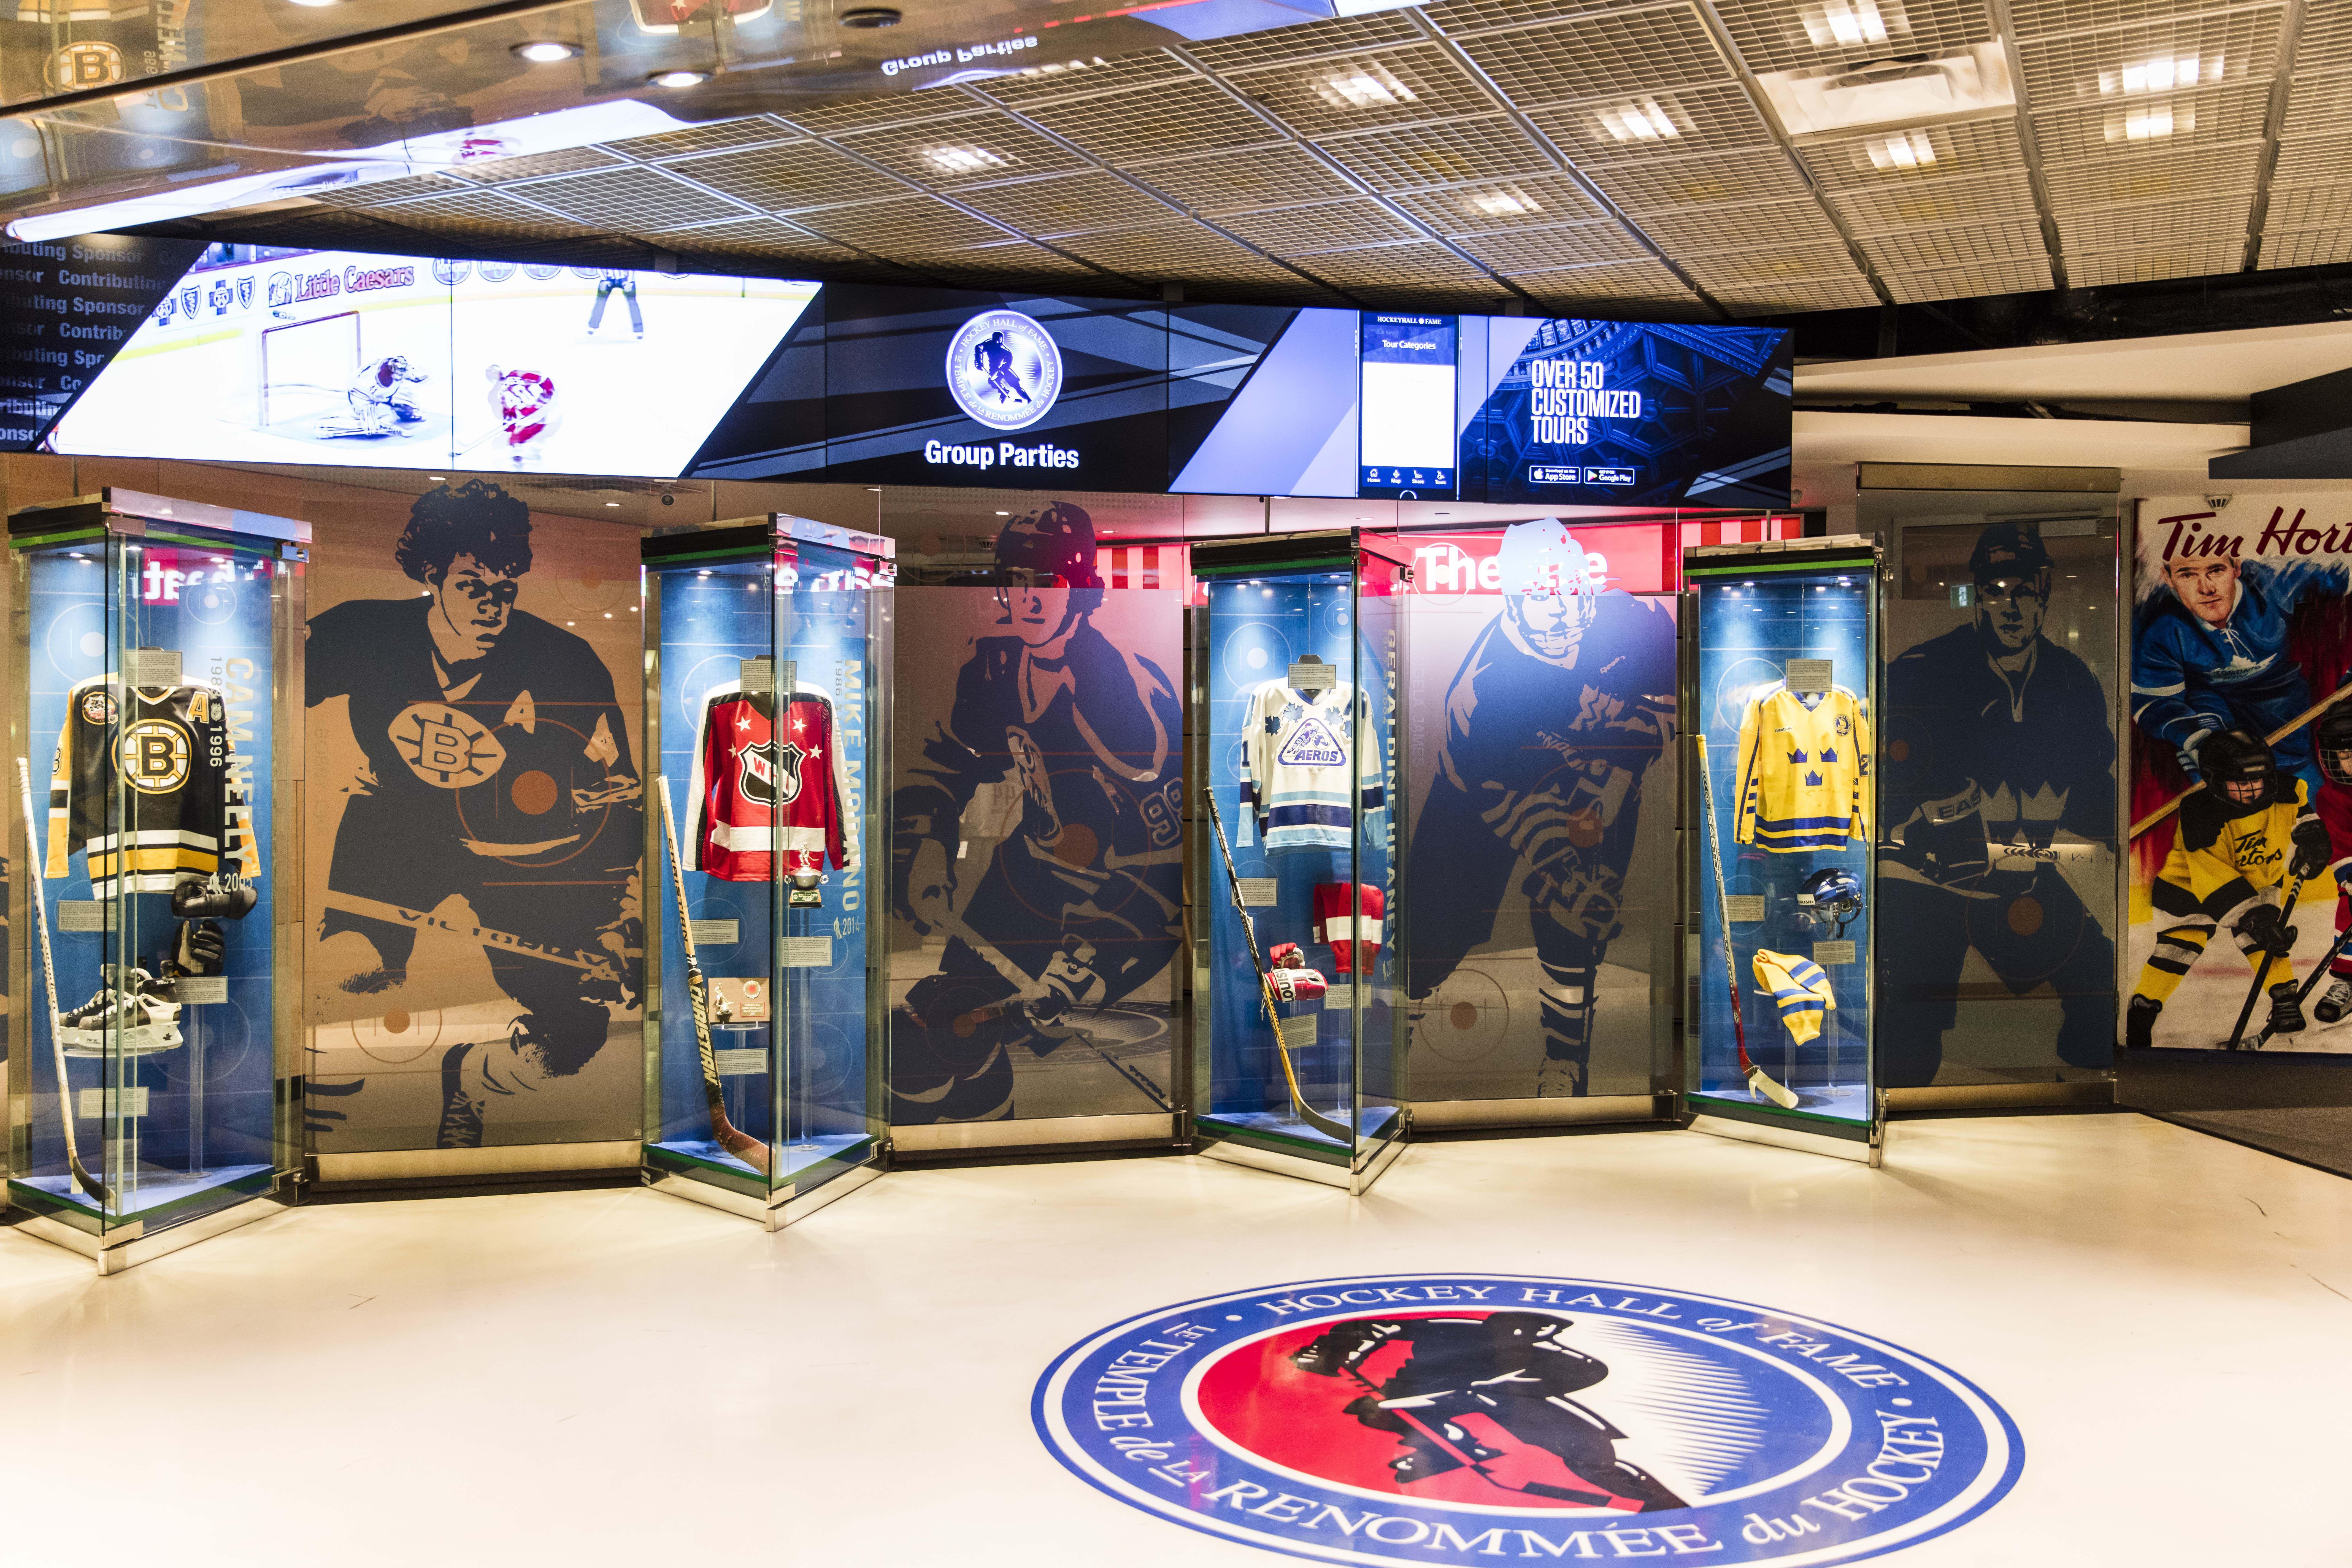 inside the Hockey Hall of Fame